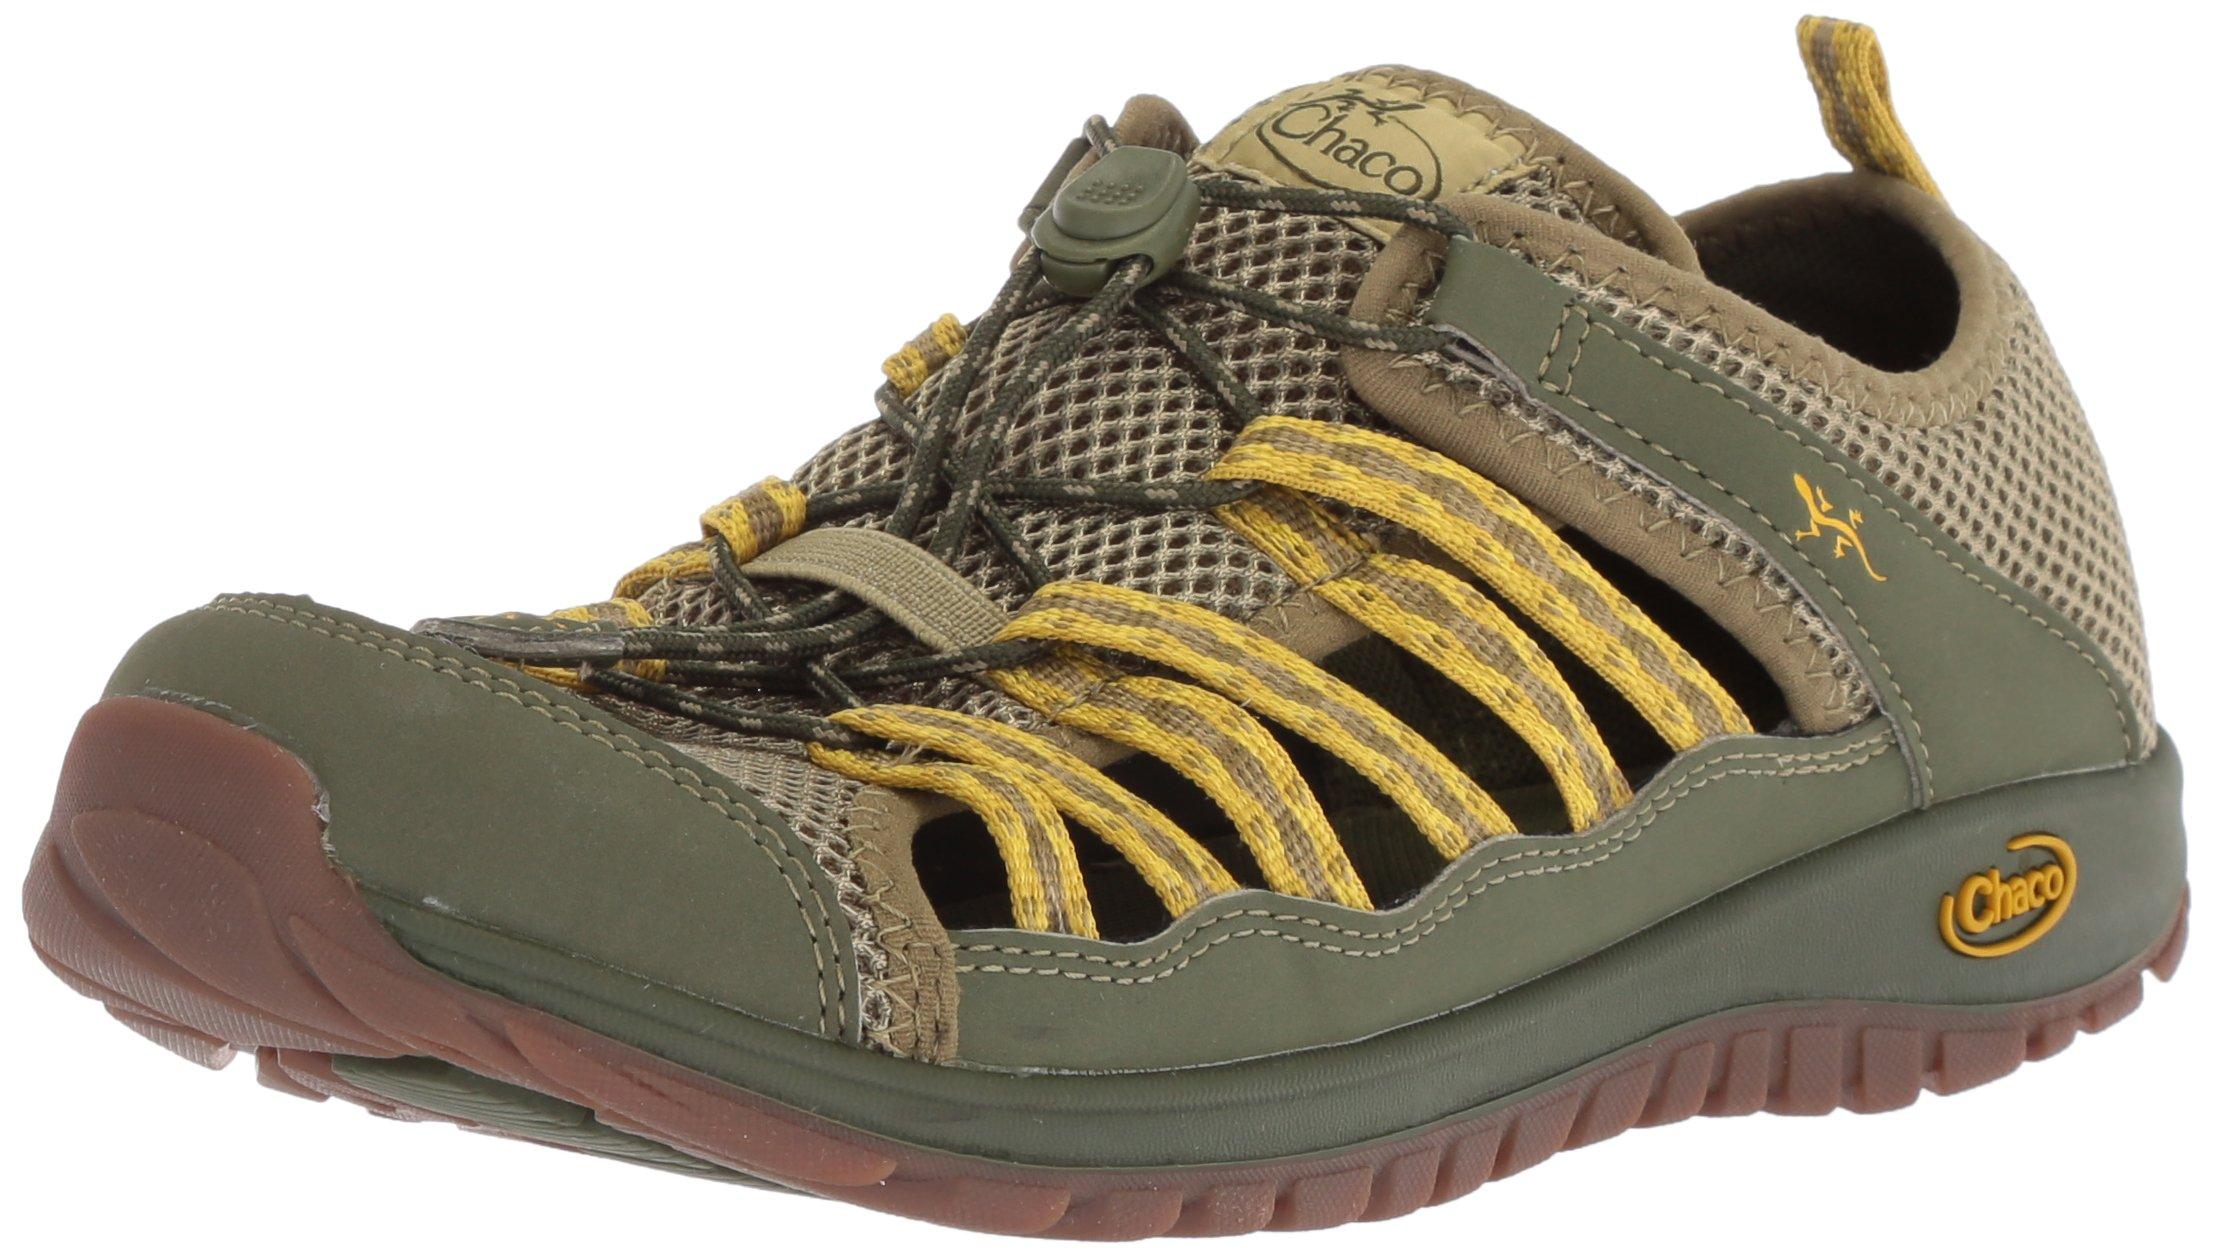 Chaco Boys' Outcross 2 Water Shoe, Avocado, 11 Medium US Little Kid